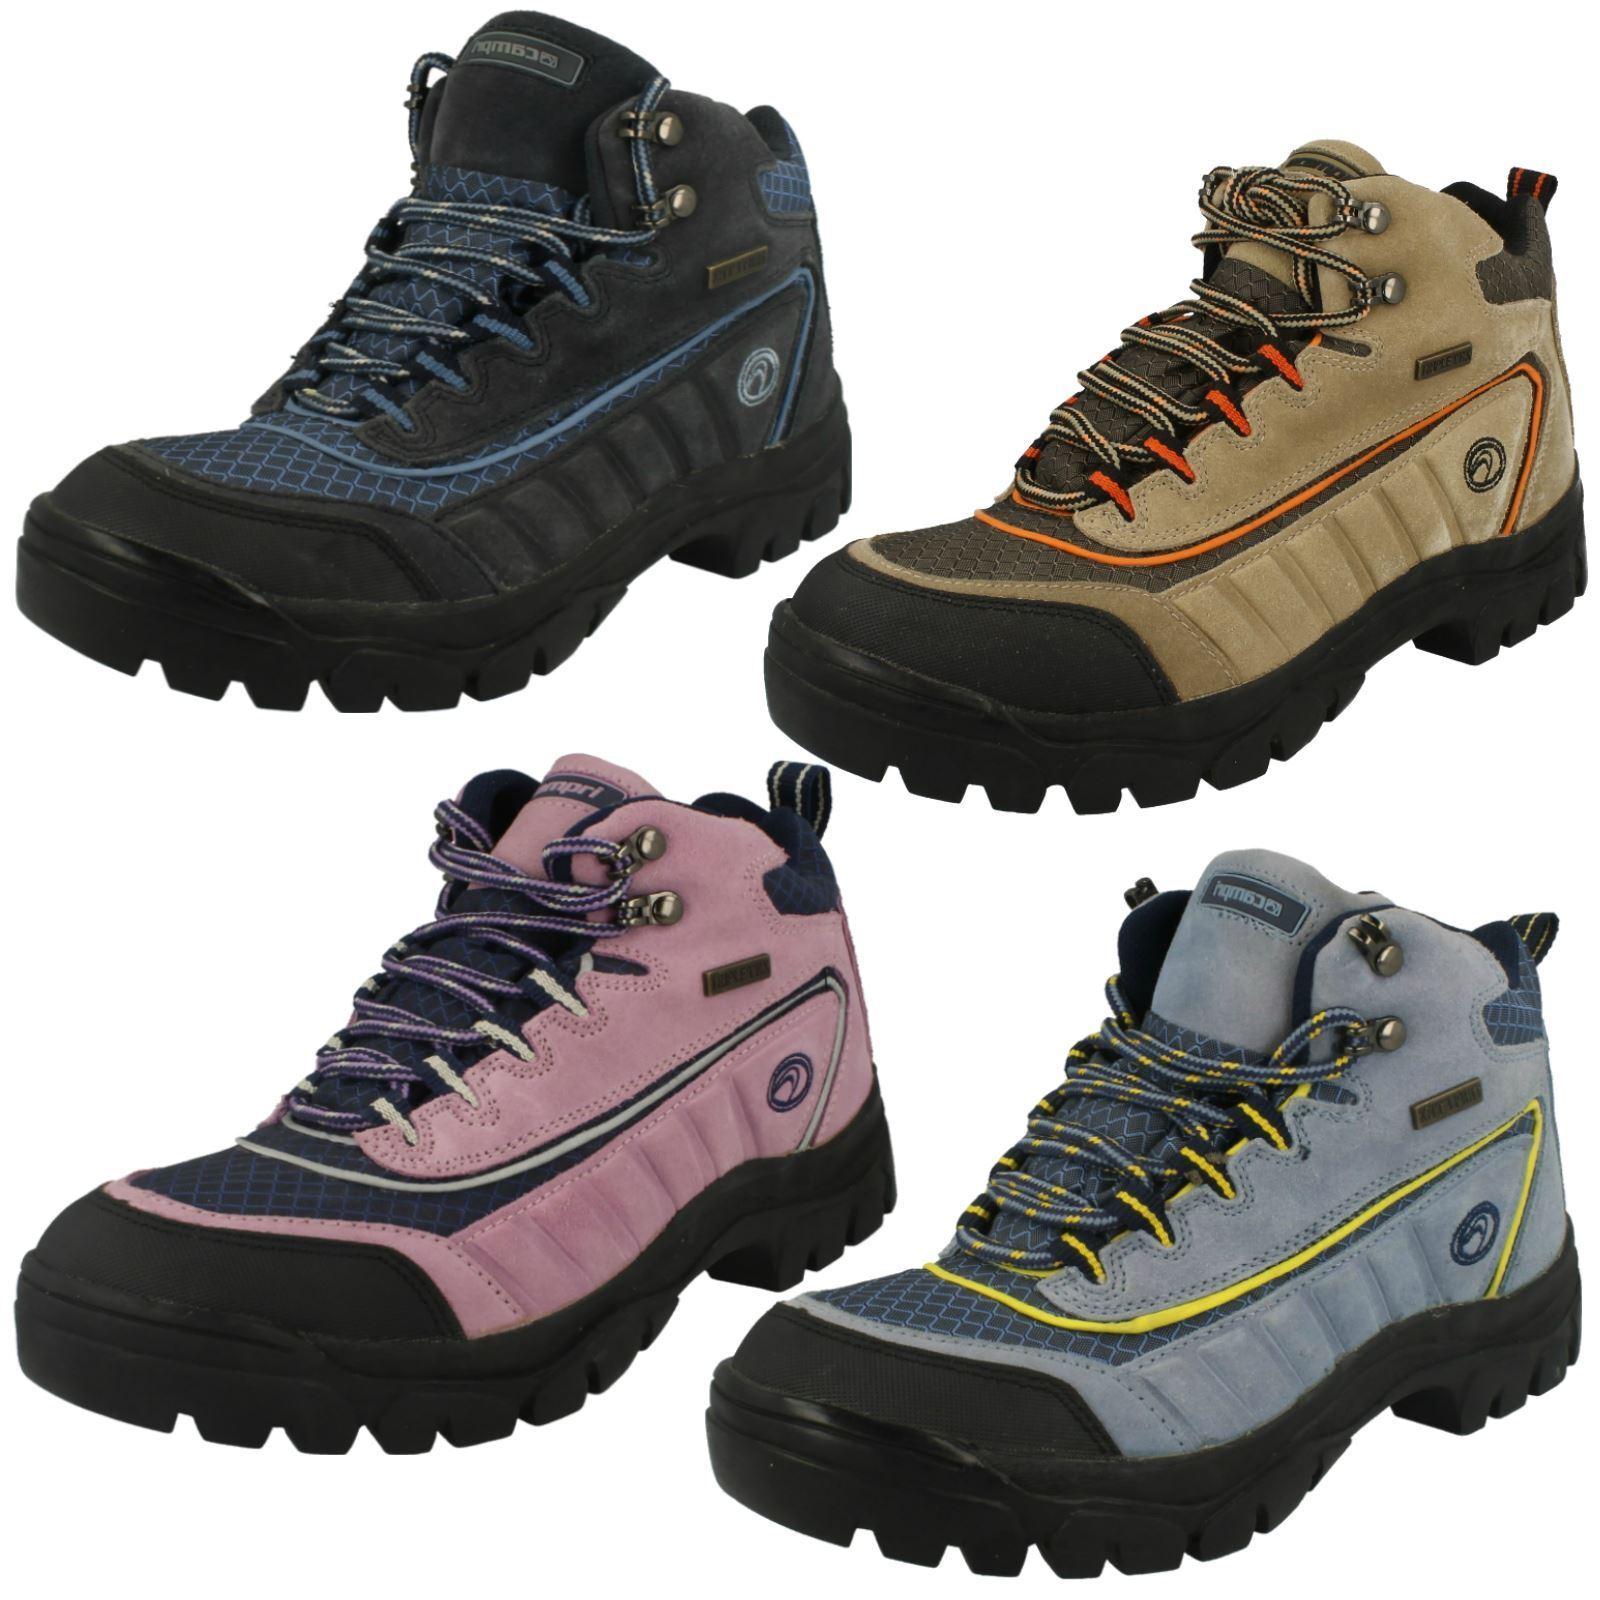 Campri Ladies Hiking Boots - Shazney